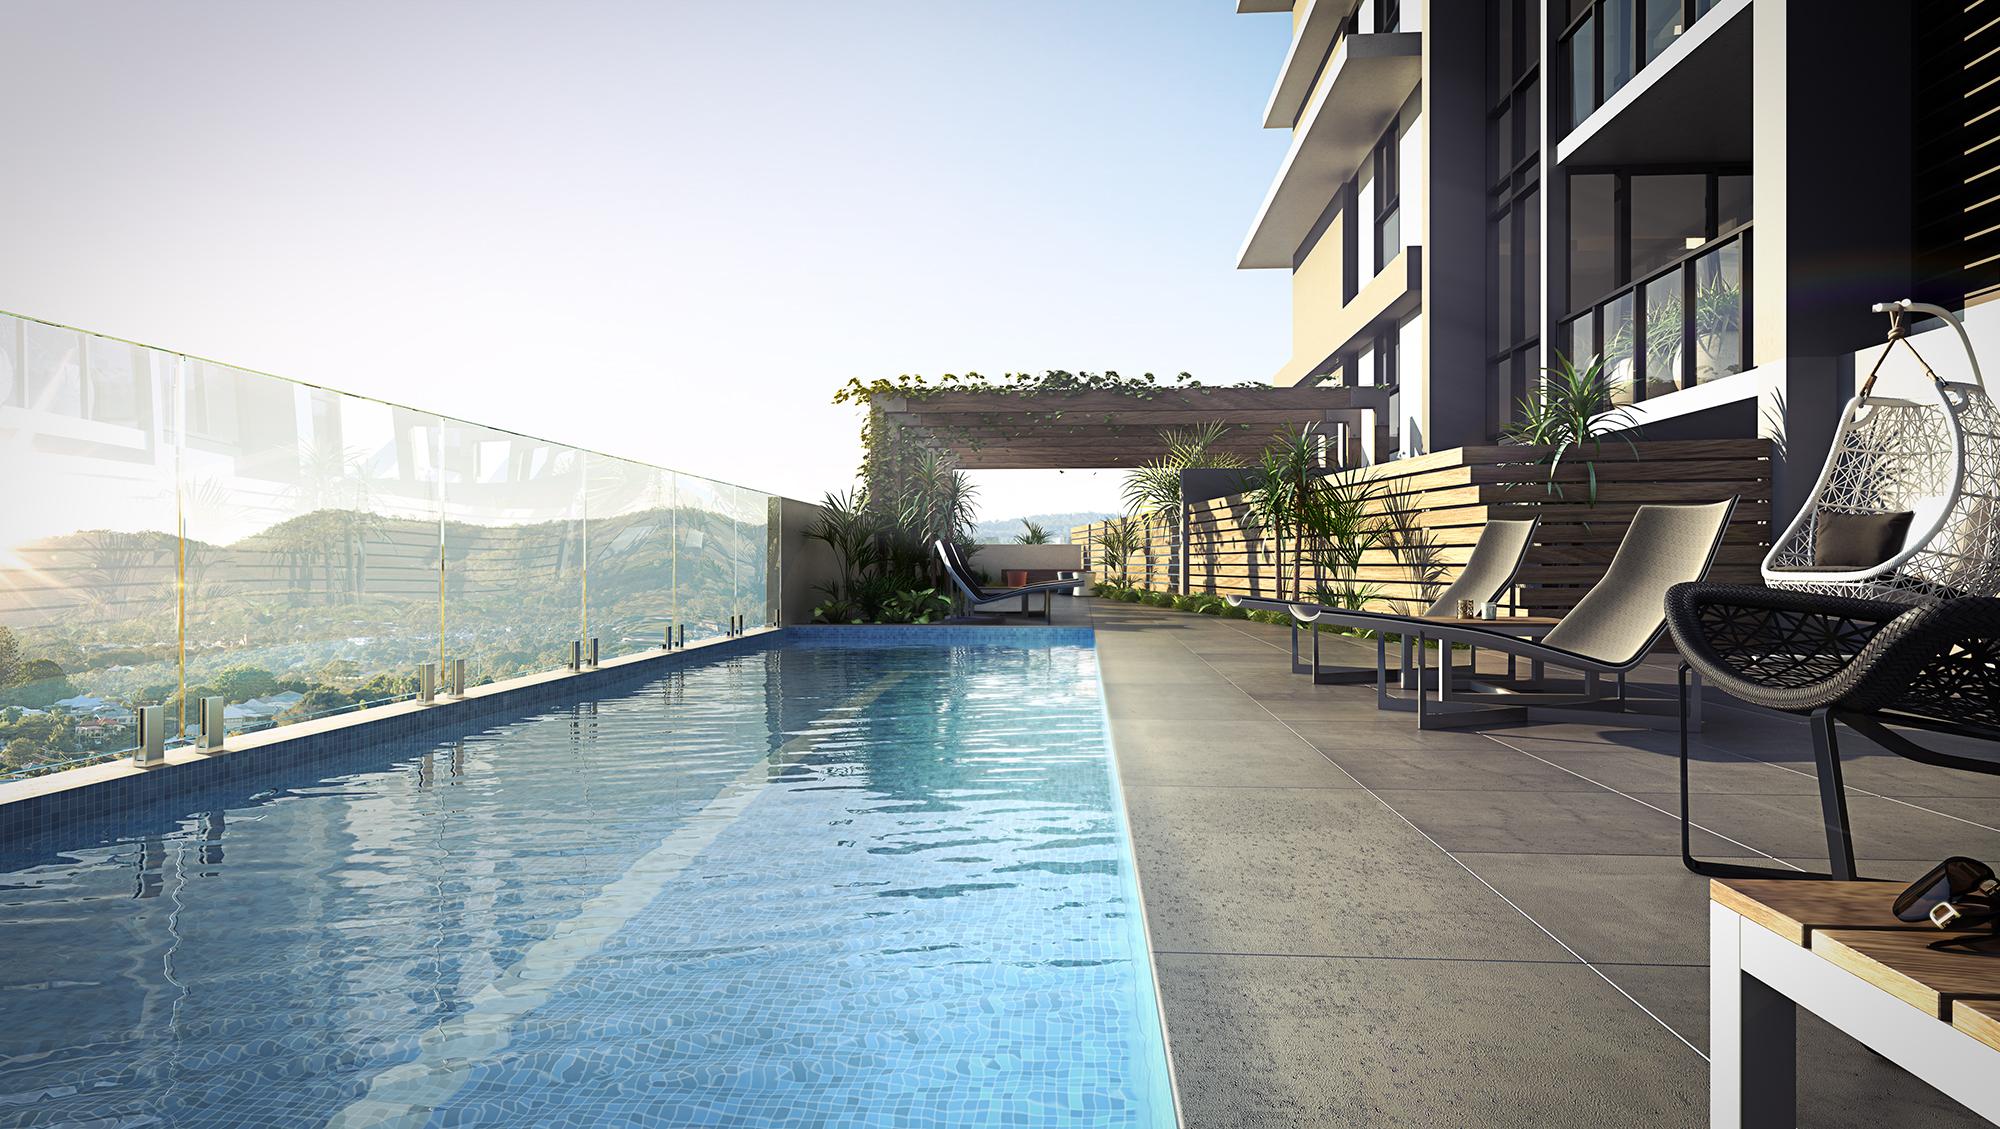 Albion - Hudson pool